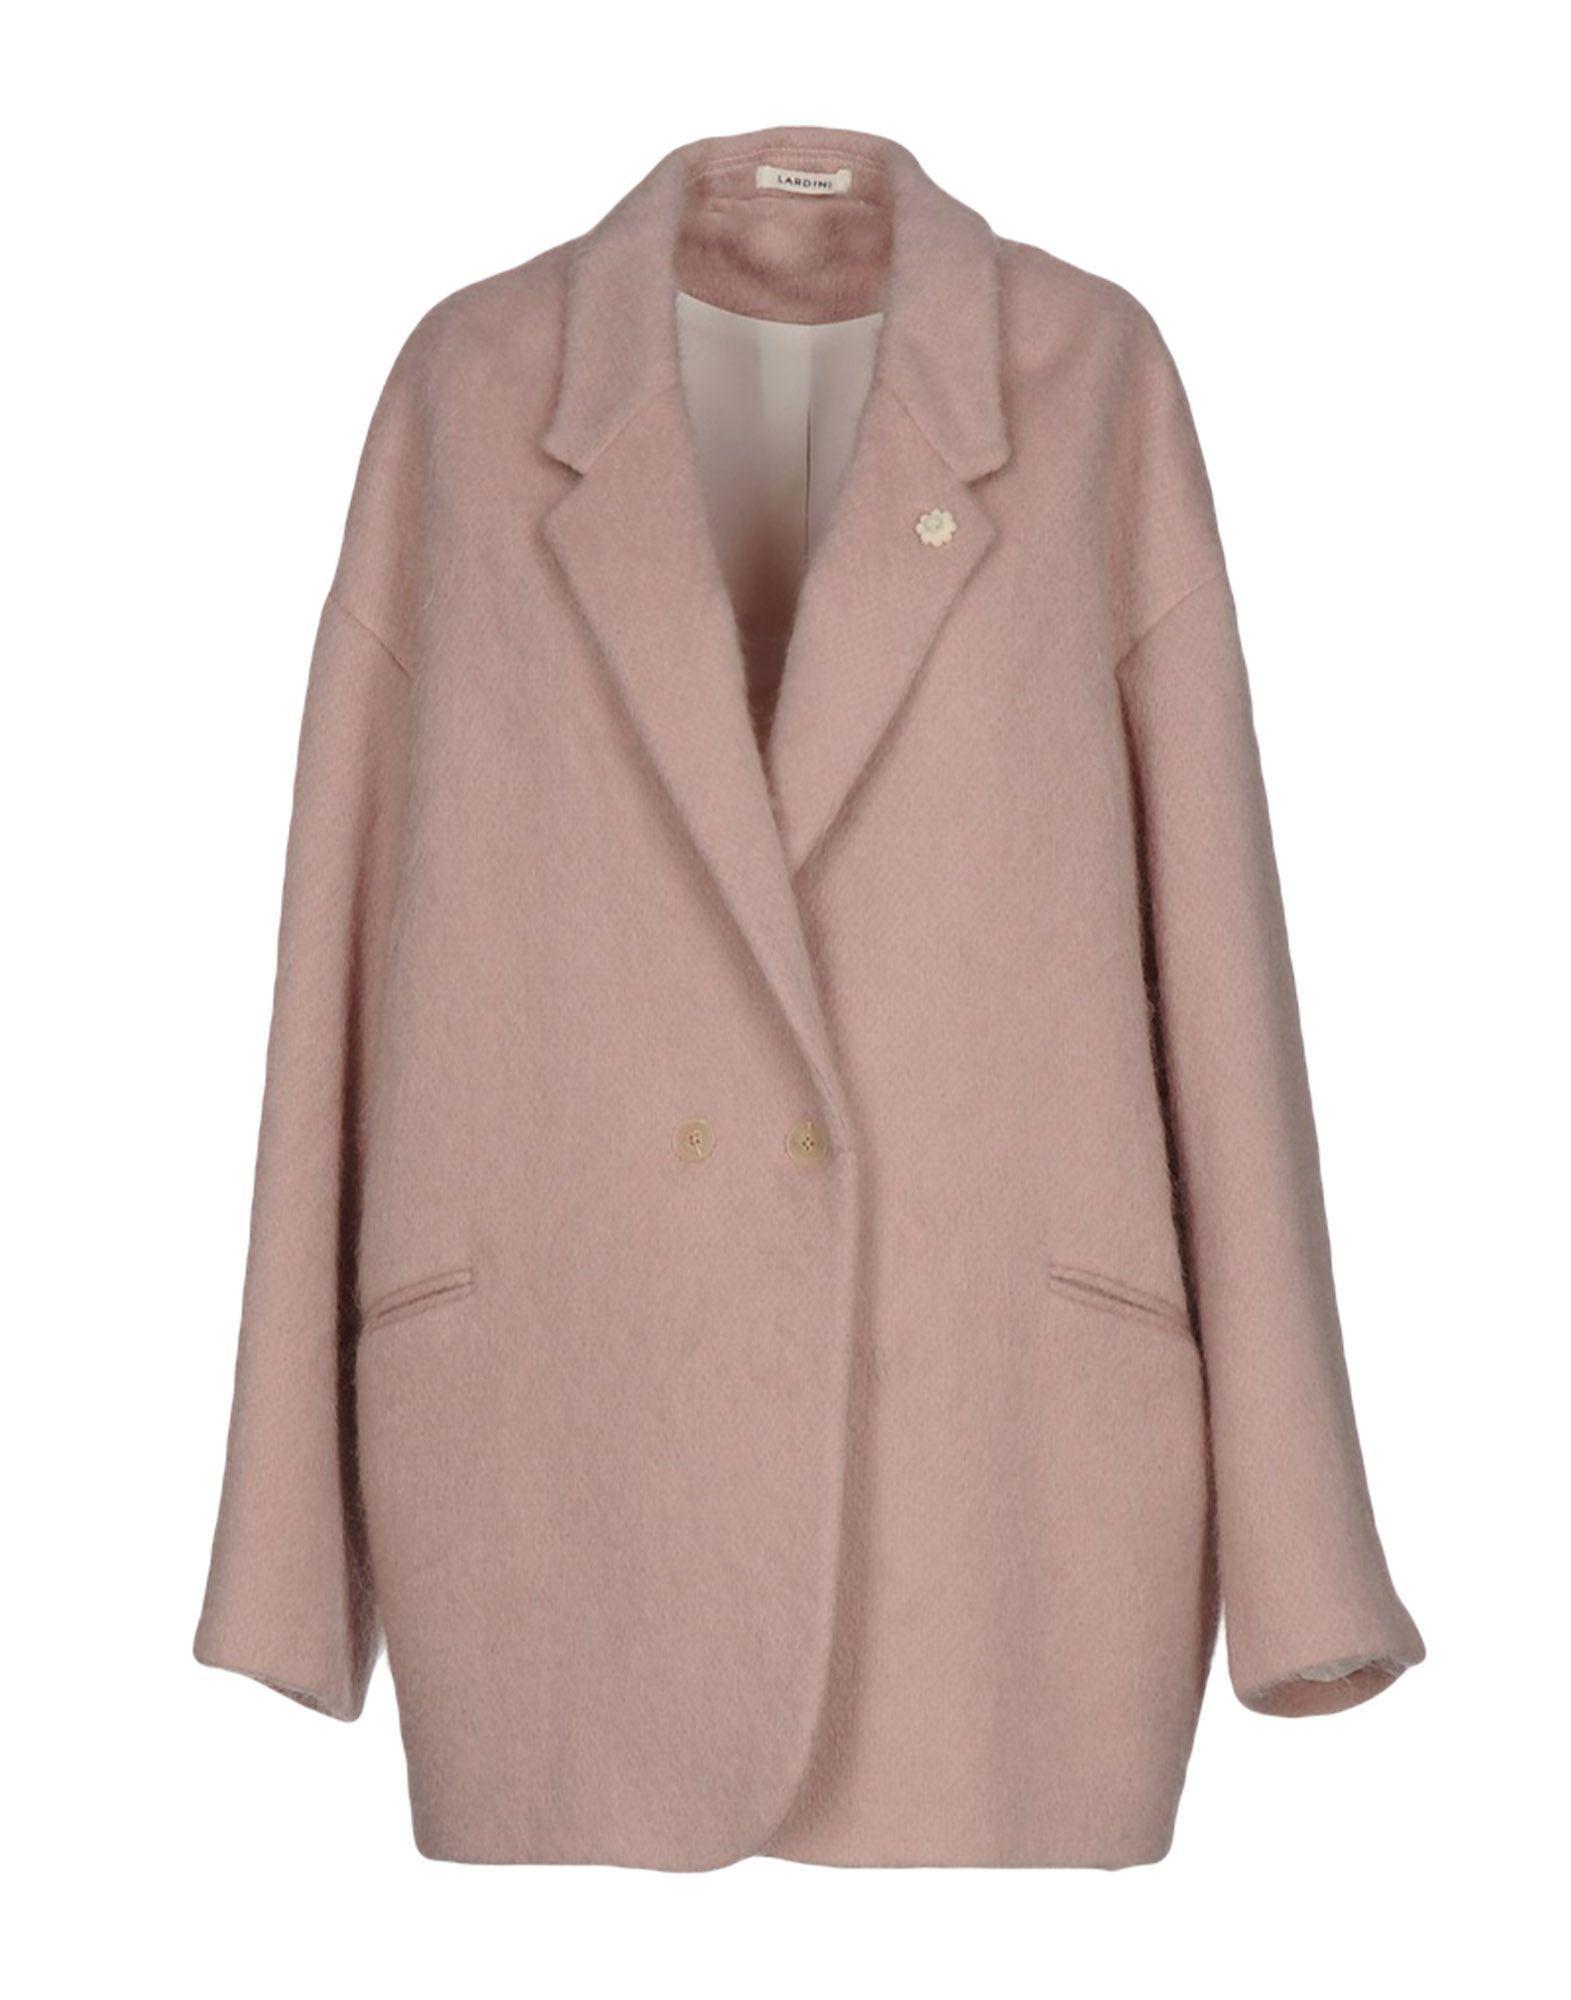 Lardini Coats In Light Pink